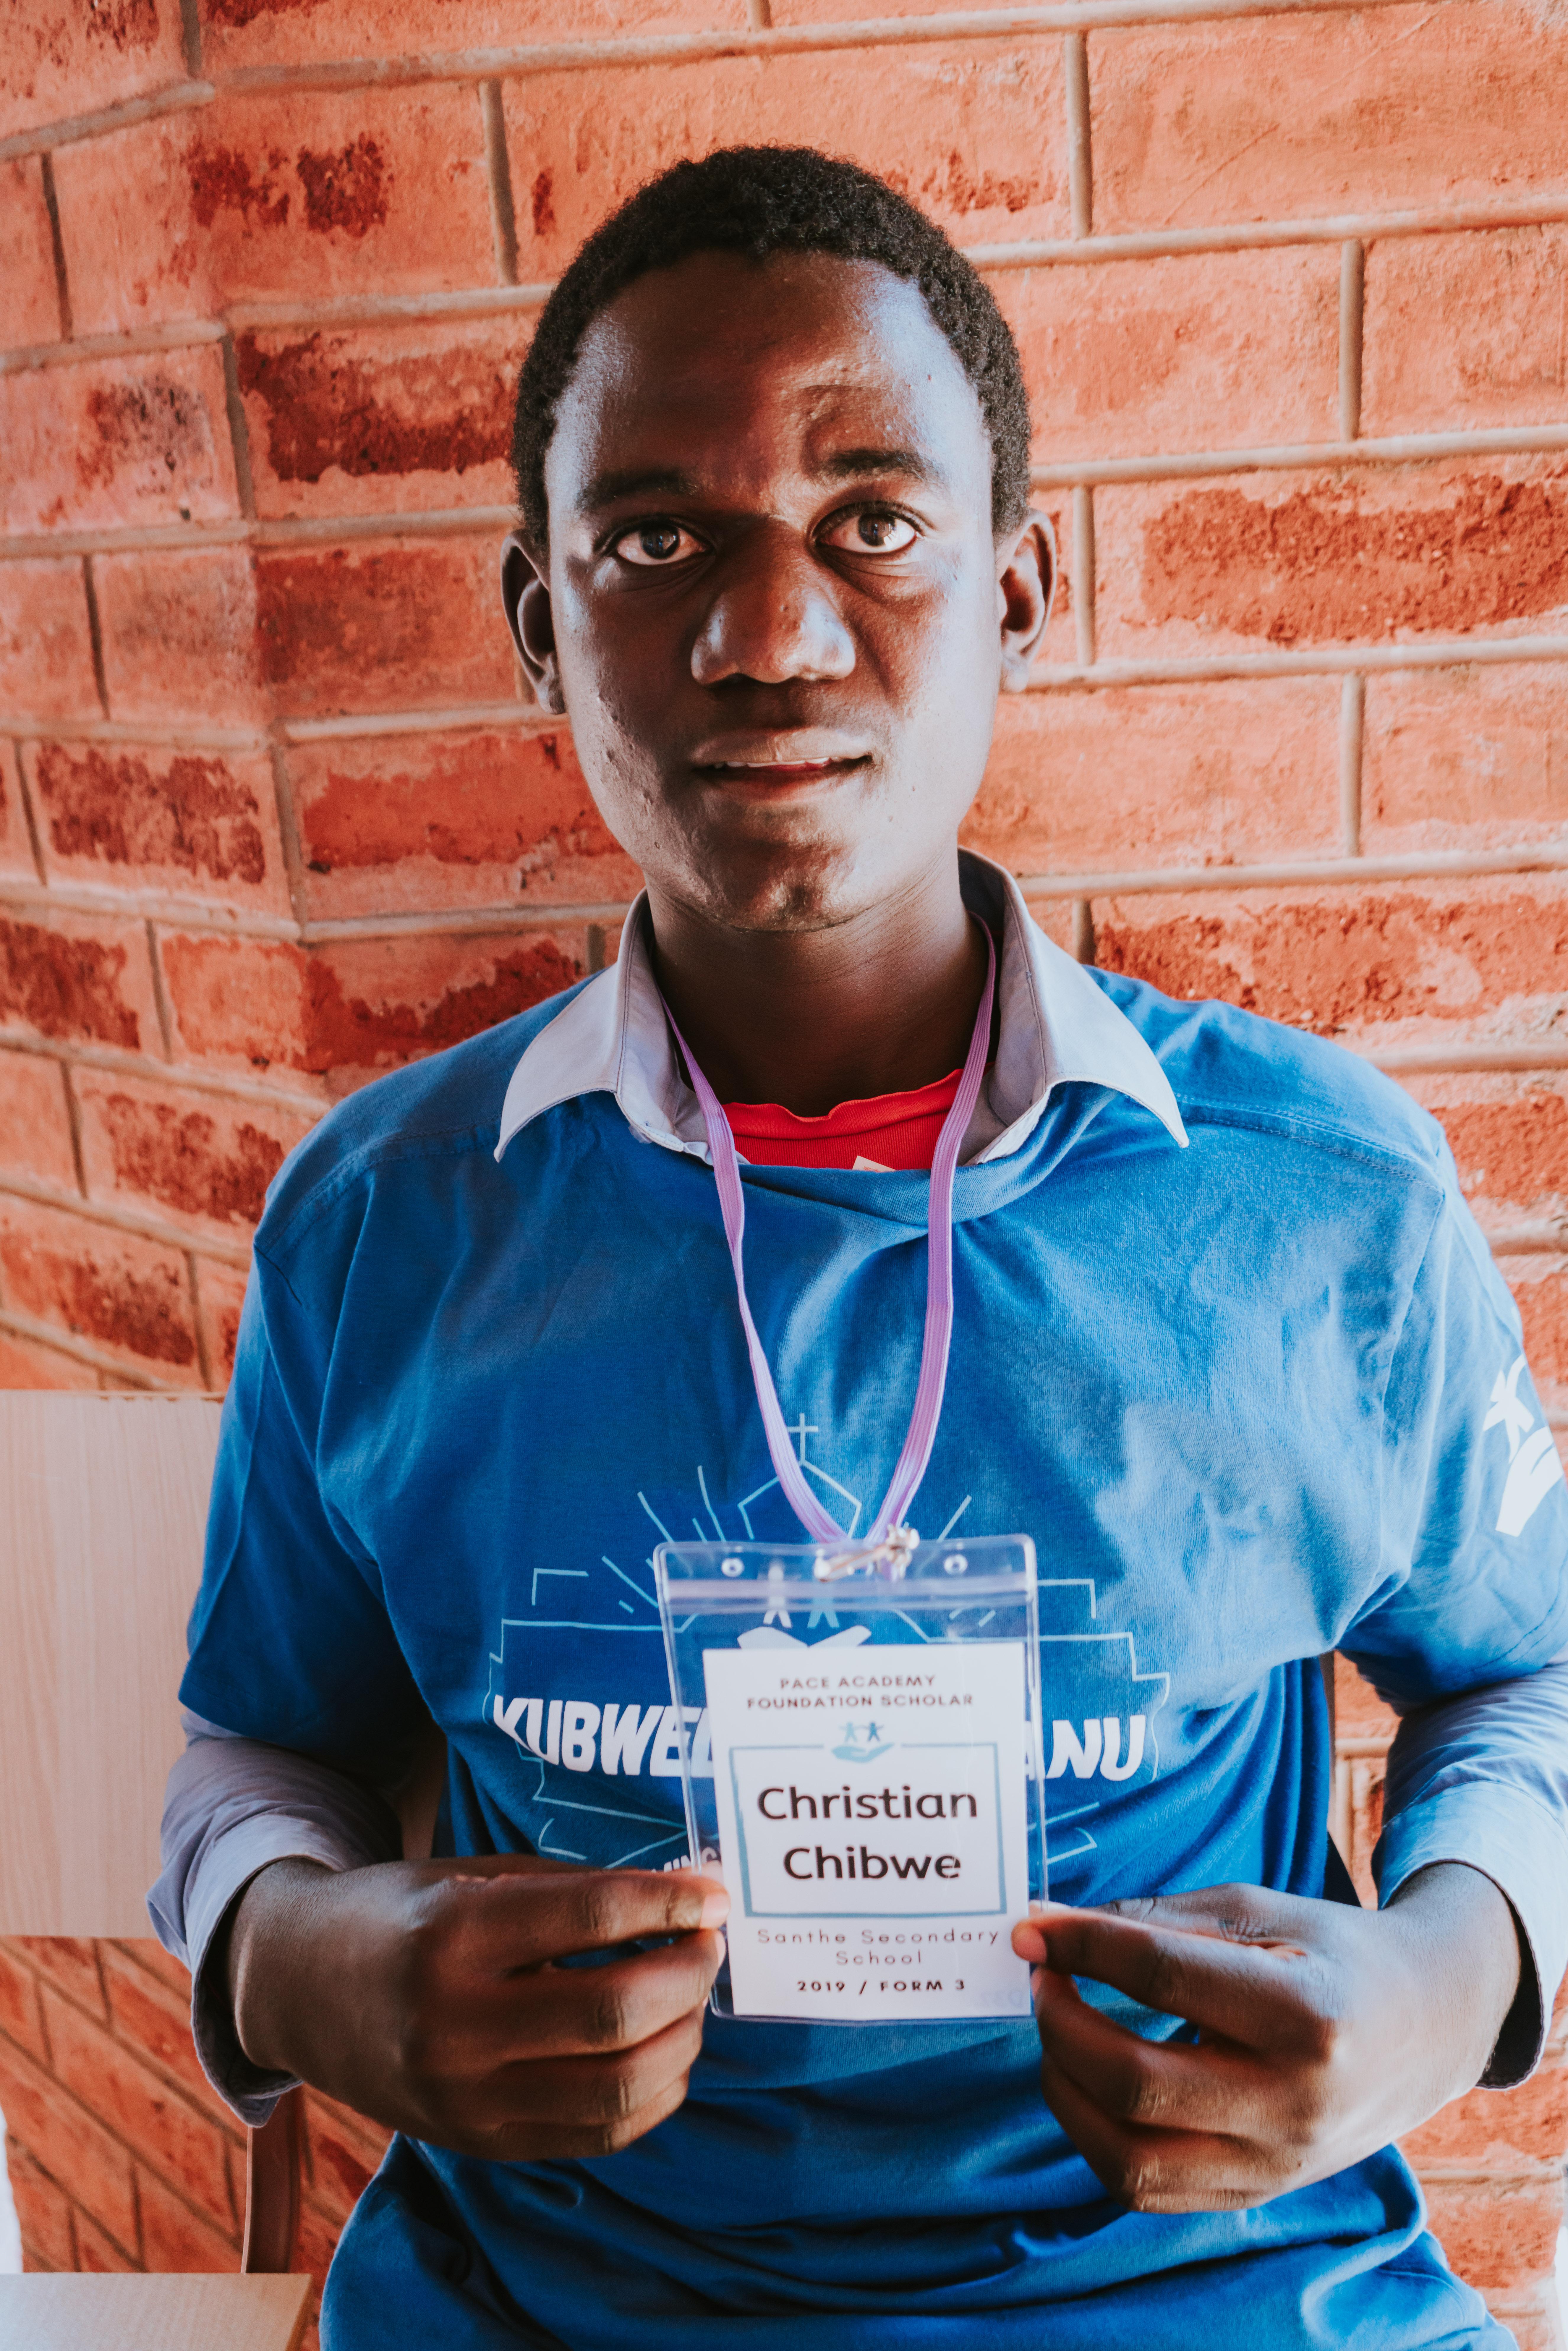 Christian Chibwe (Santhe Secondary Schoo